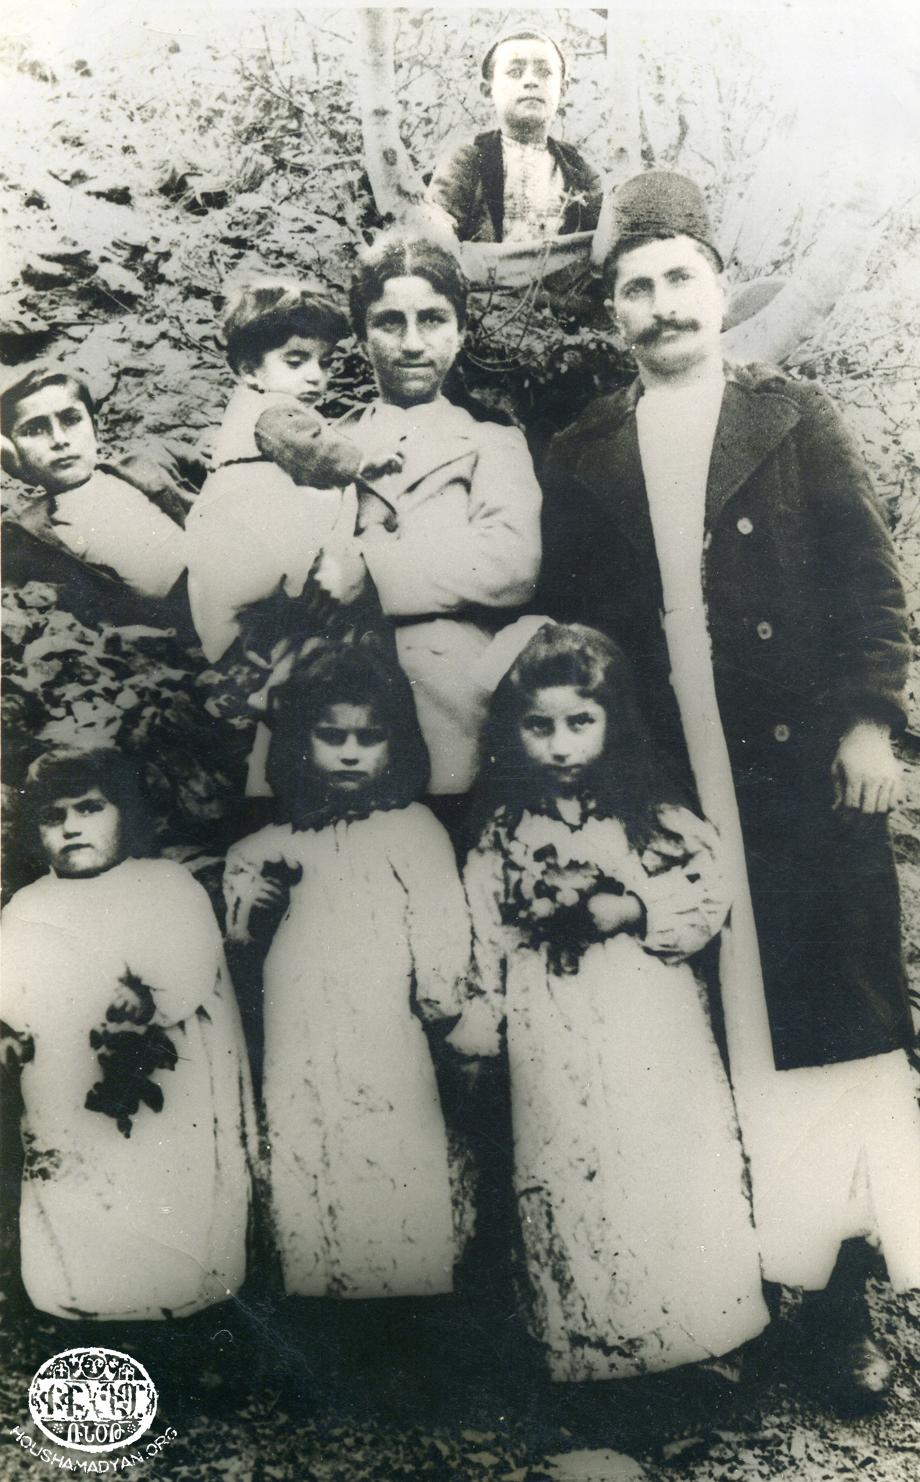 Sis - 1905 or 1906. The two adults standing in the photo are Hagop Giuliudjian and his wife Tskhiun Giuliujian